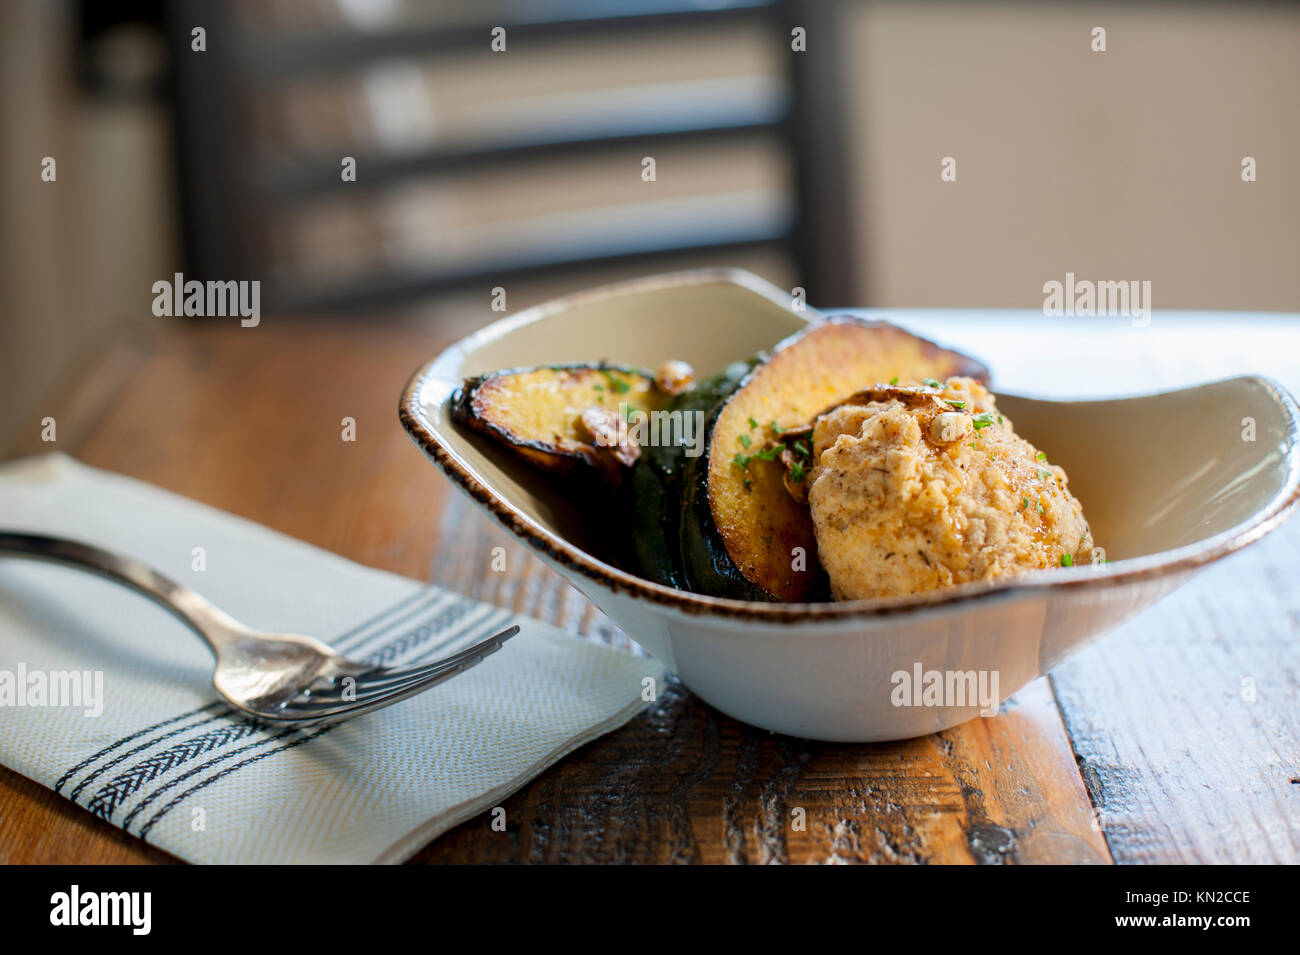 USA Virginia Williamsburg VA Culture Cafe serving fried mozzarella and acorn squash - Stock Image